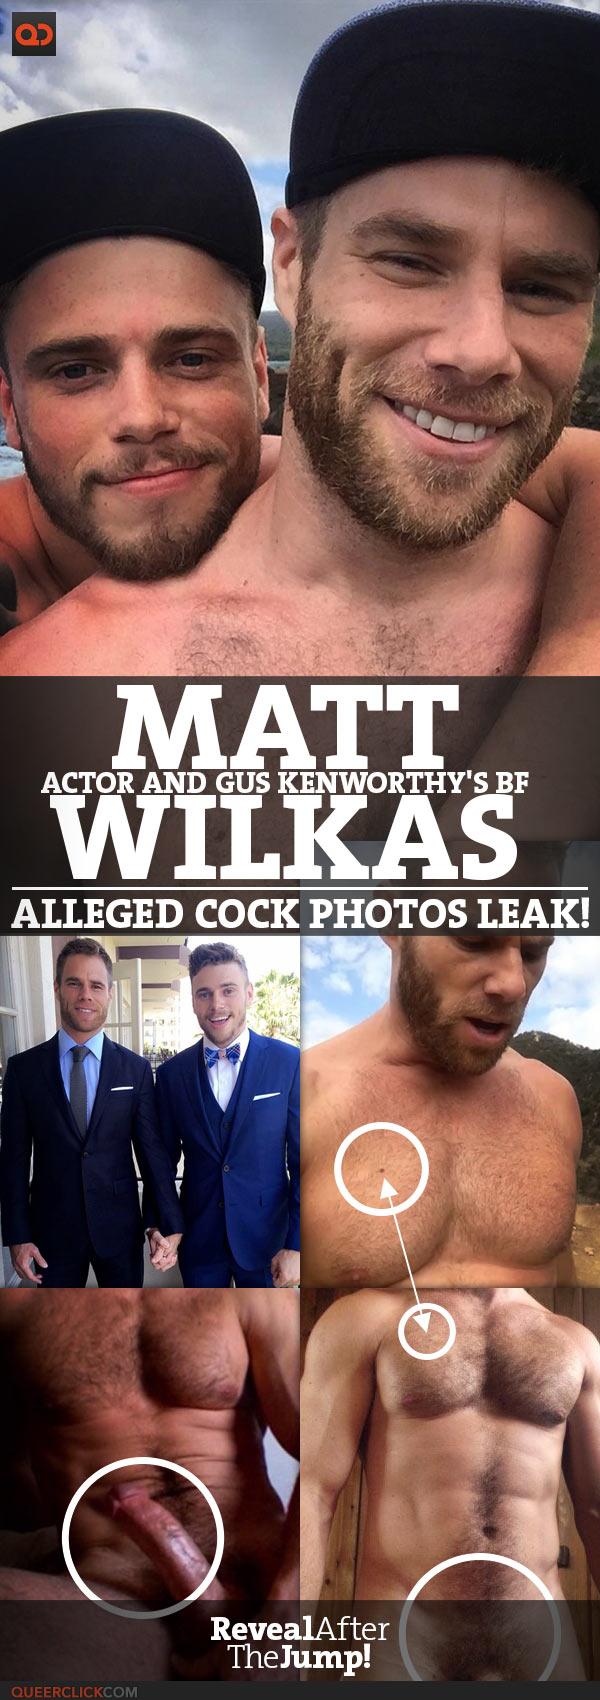 Matt Wilkas, Actor And Gus Kenworthy's BF, Alleged Cock Photos Leak!